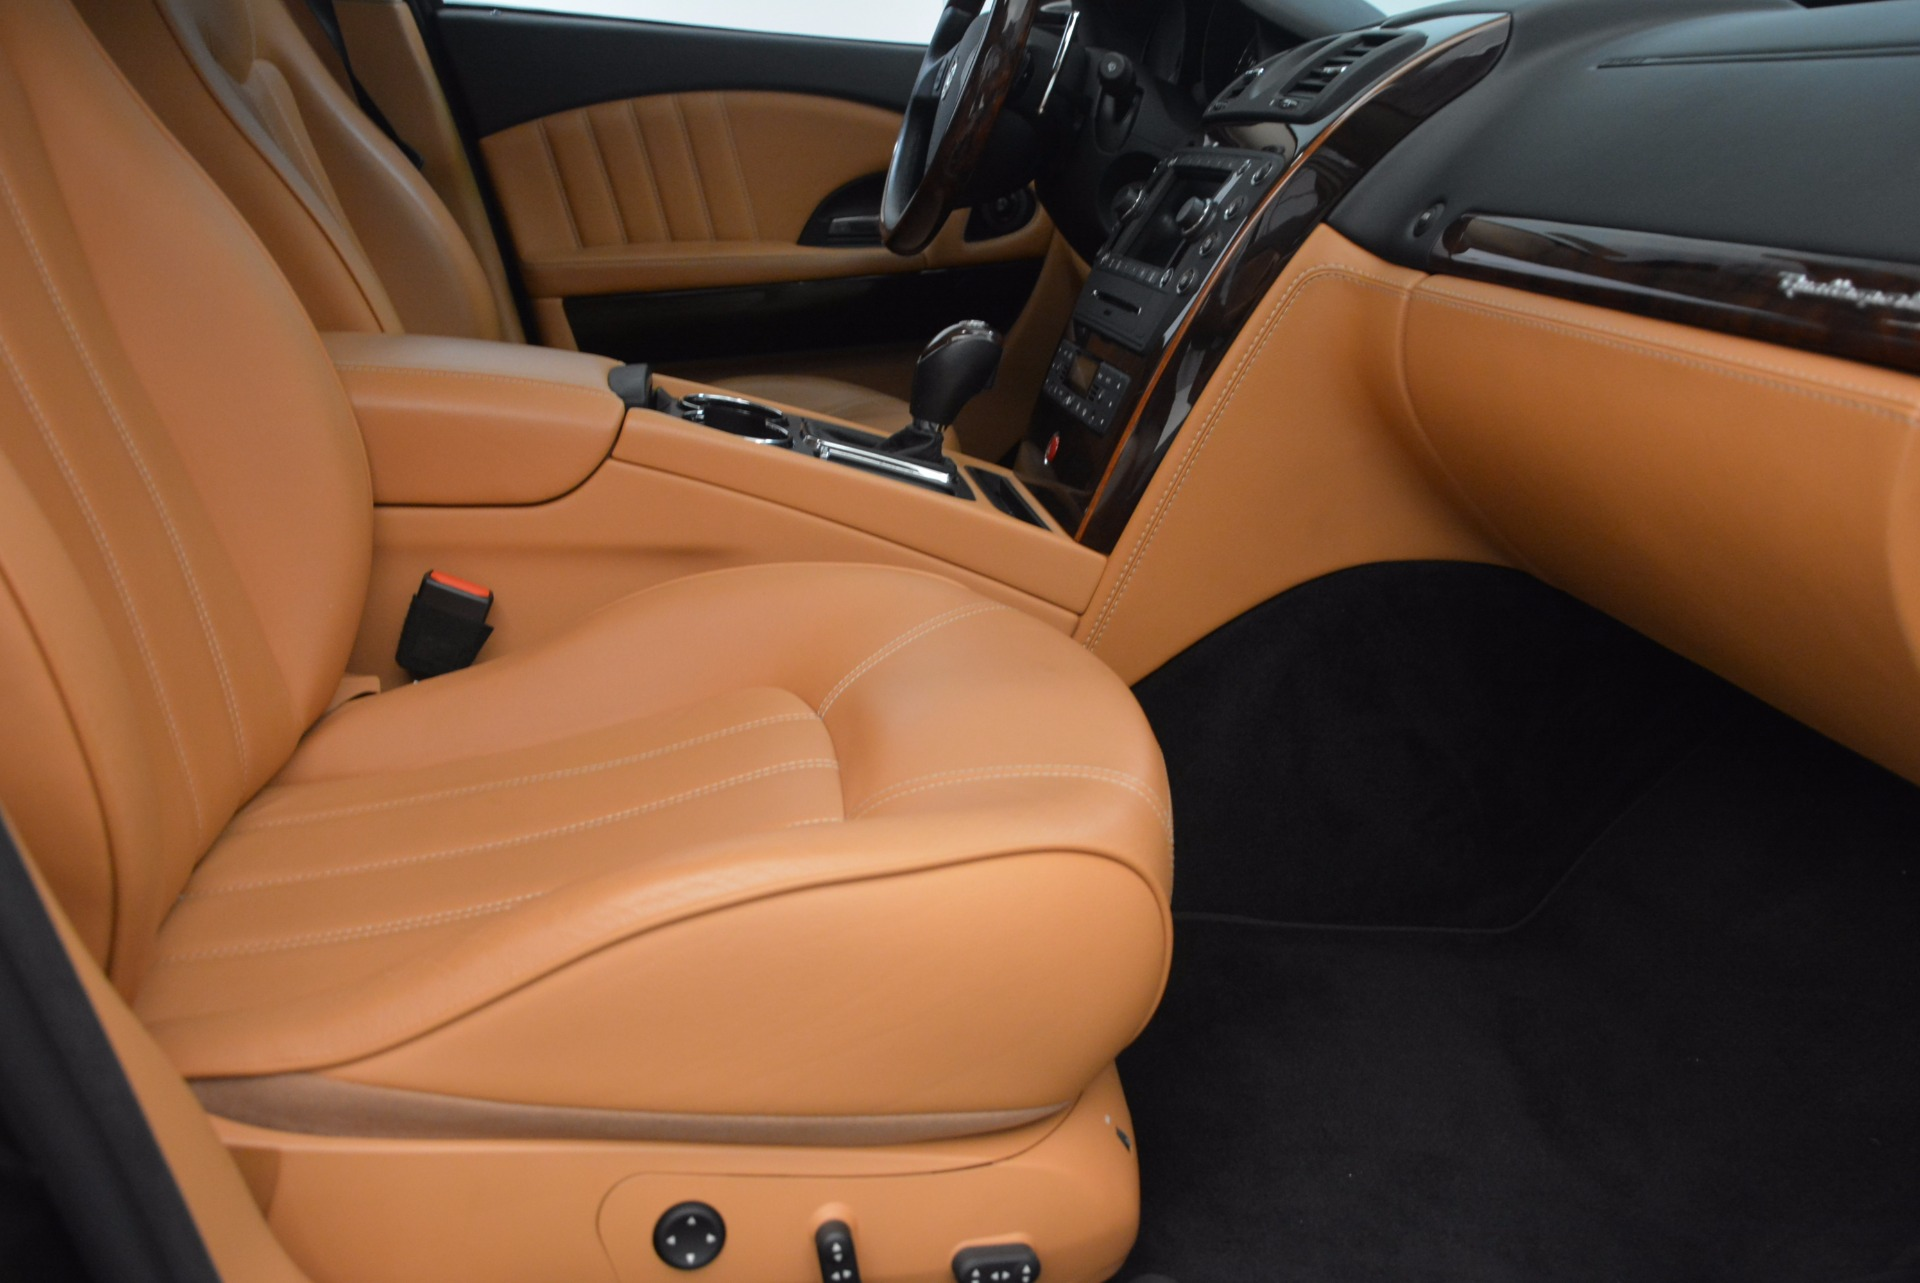 Used 2010 Maserati Quattroporte S For Sale In Westport, CT 1551_p35